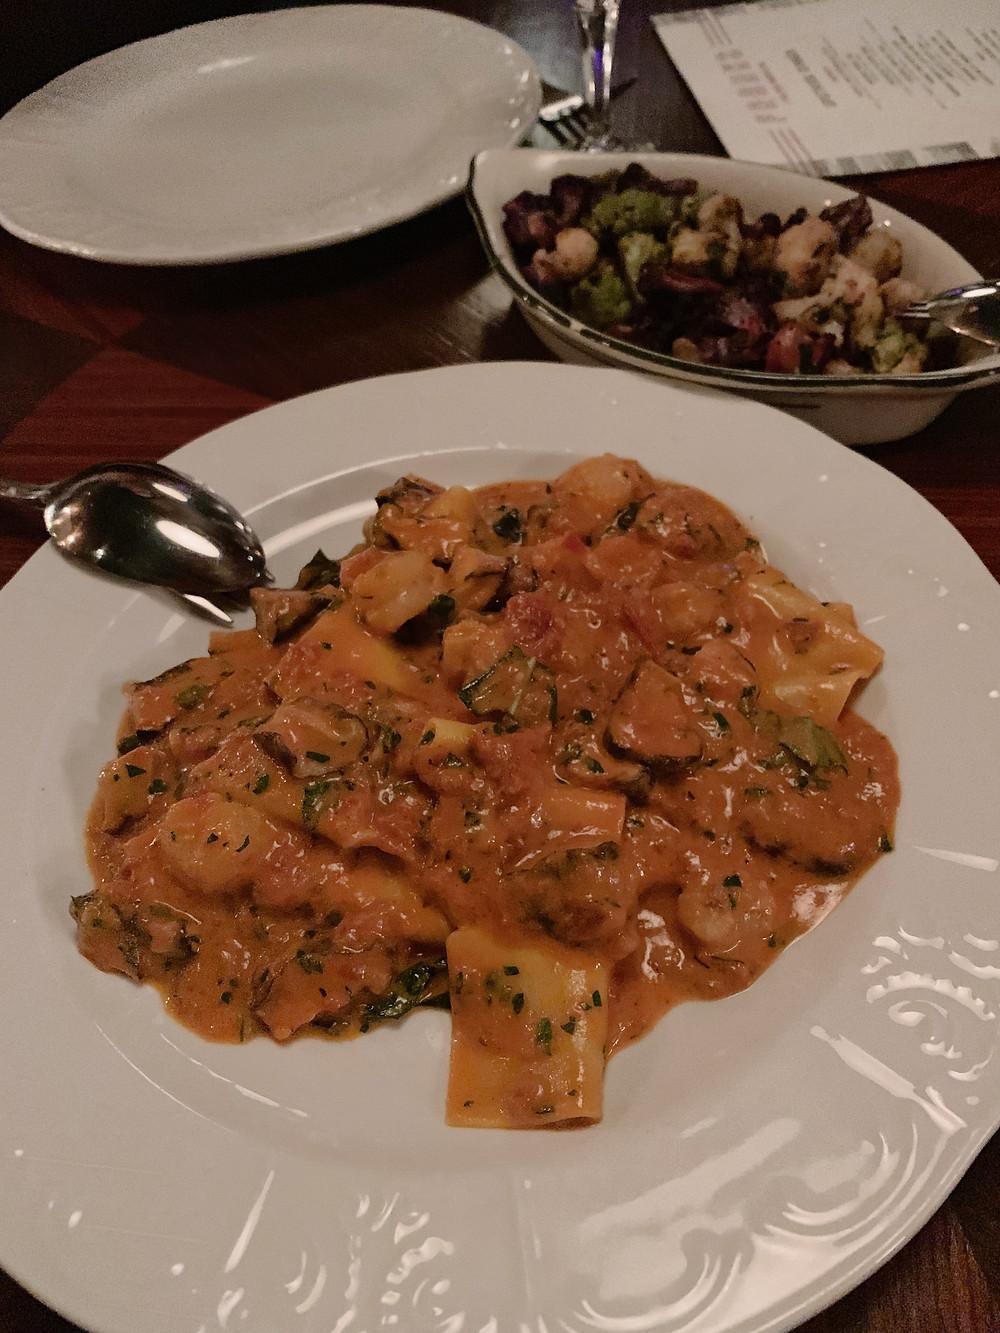 Food at Franks Italian restaurant in Hong Kong